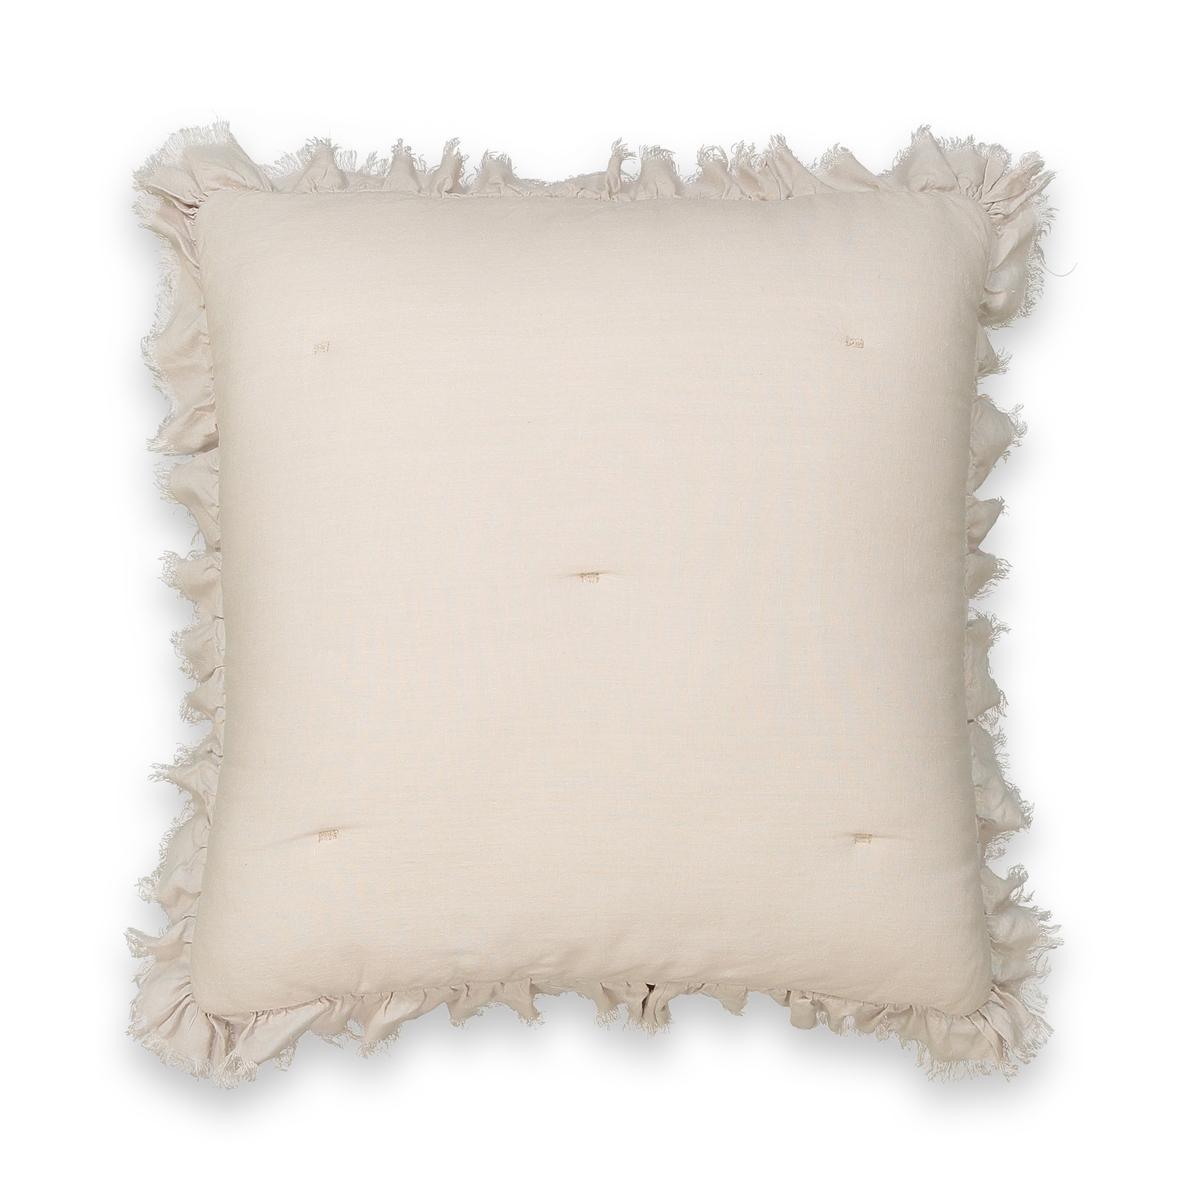 Чехол на подушку-валик из льна и вискозы NILLOW валик fit 01853